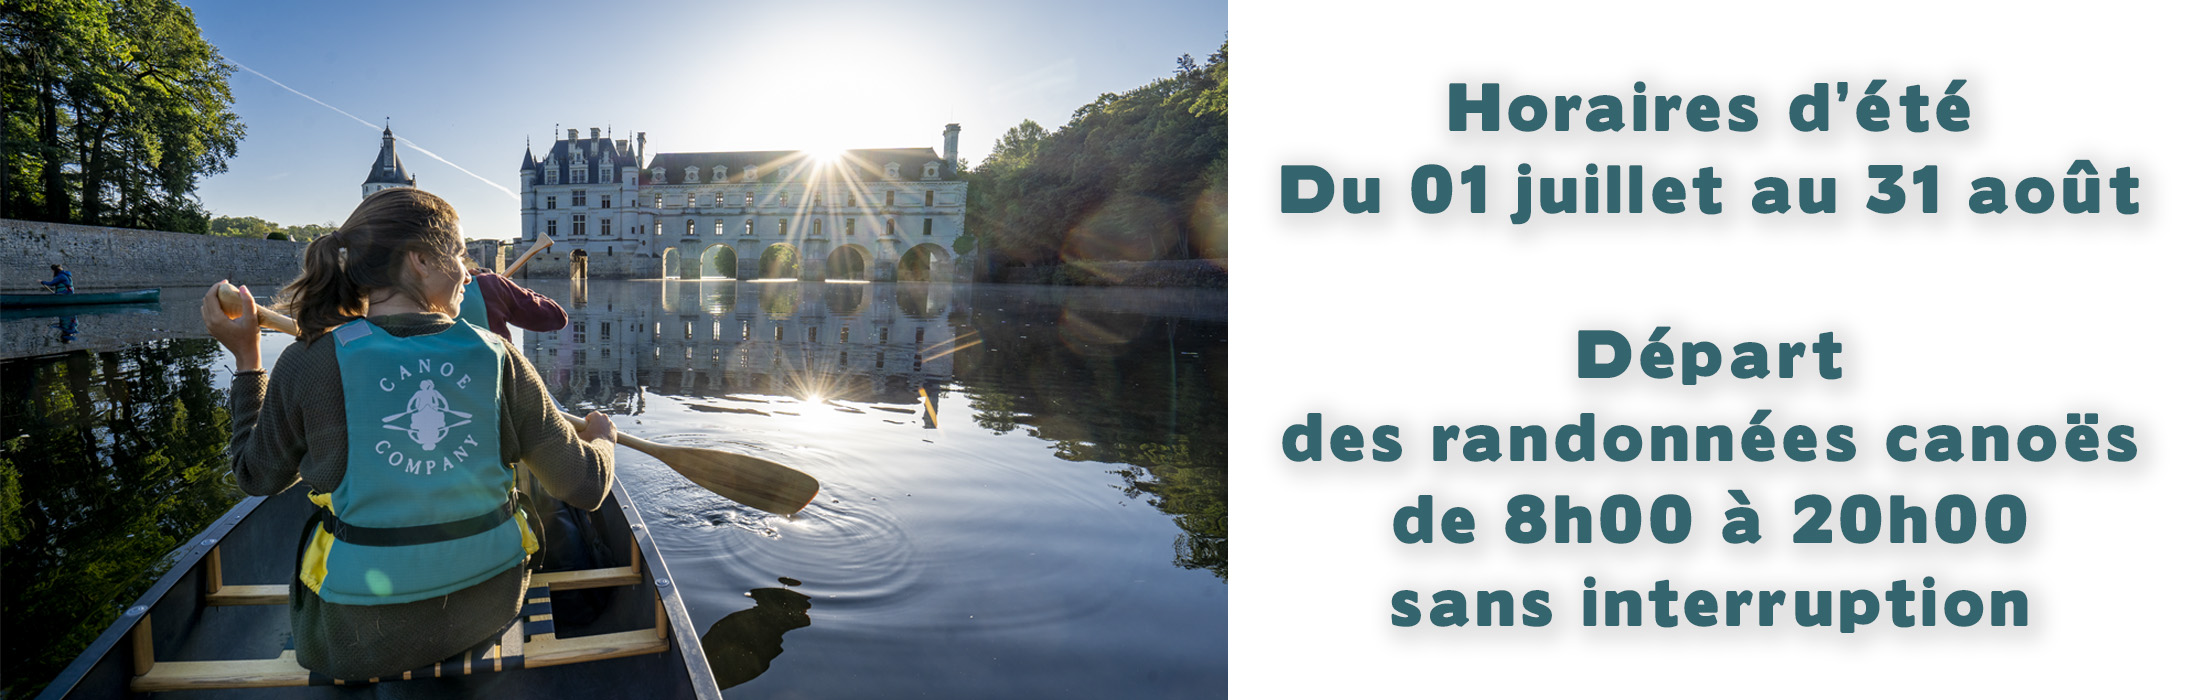 Canoe Company, canoe canadien chenonceaux, chenonceau